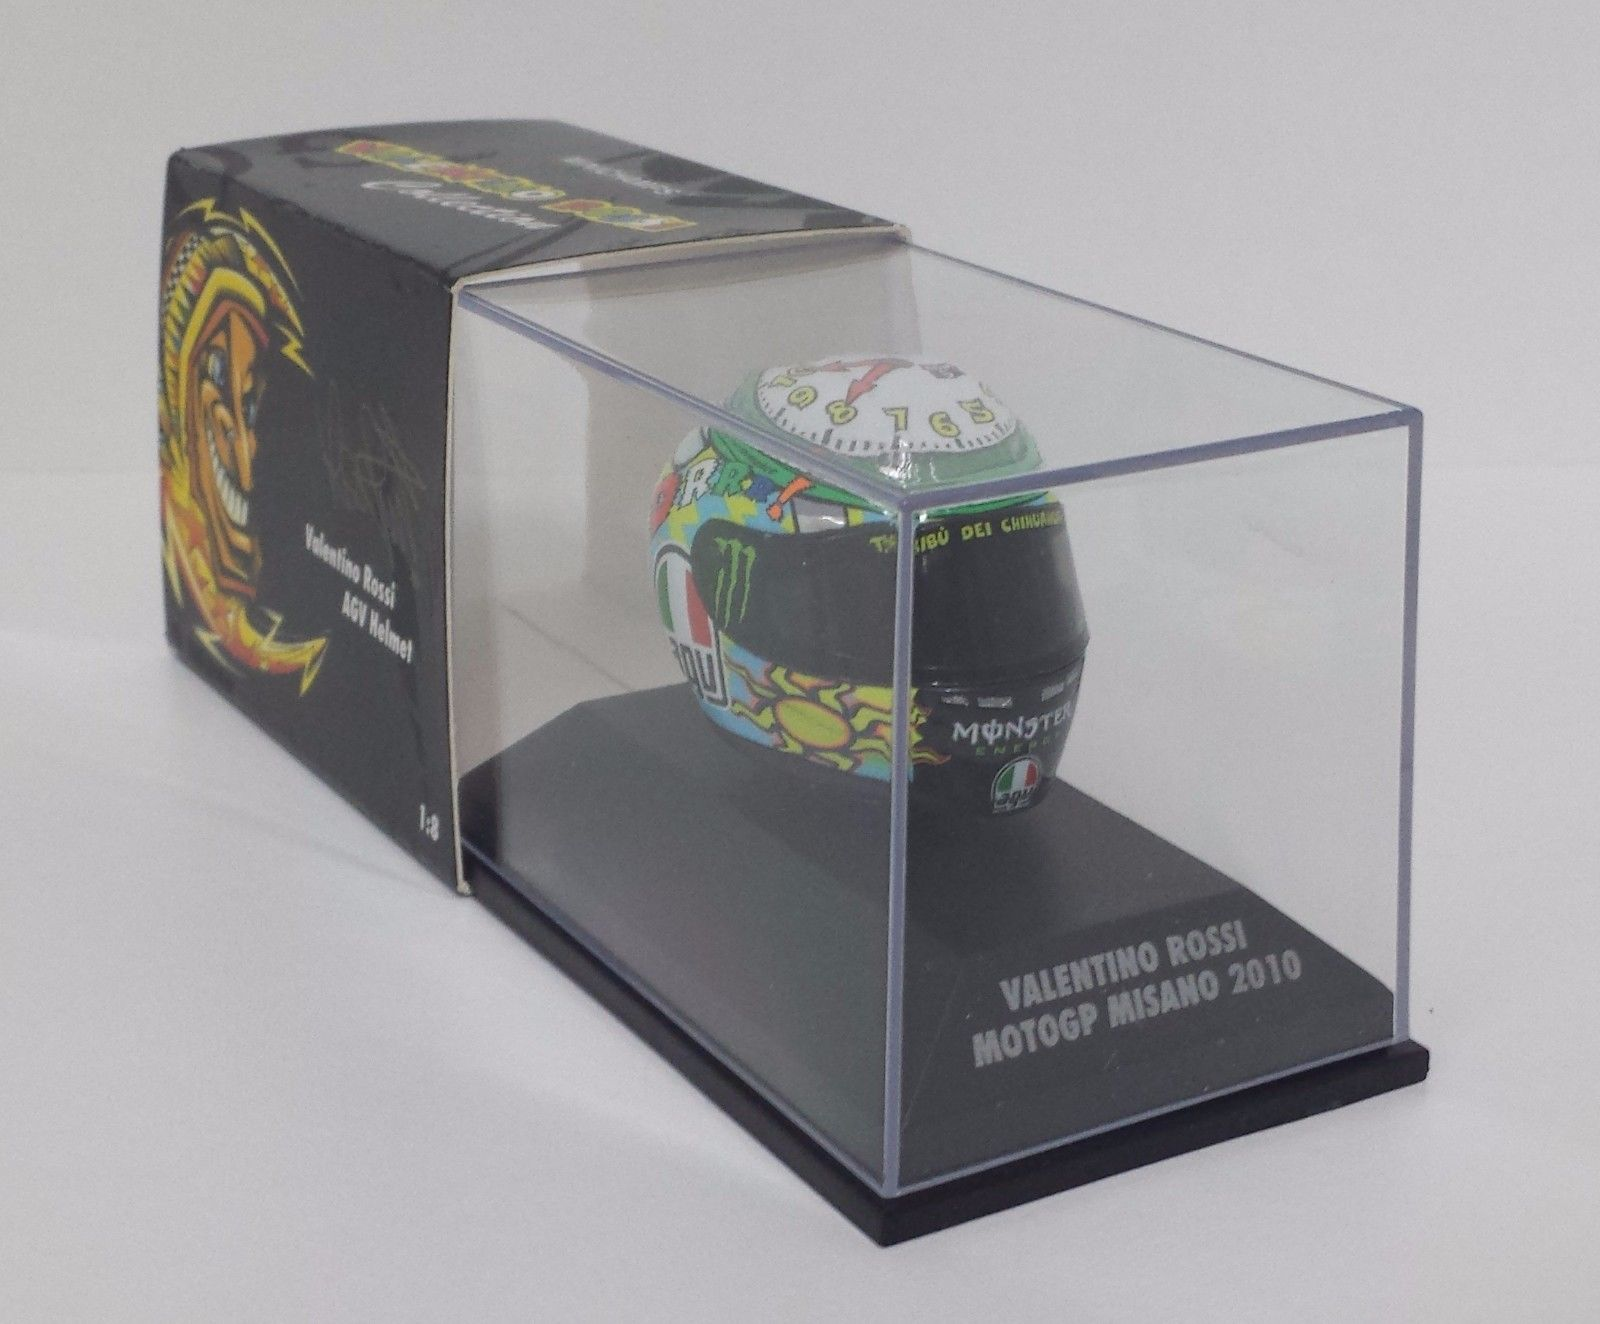 MINICHAMPS VALENTINO ROSSI AGV CASCO HELMET 1/8 CLOCK ARTWORK MOTOGP MISANO 2010